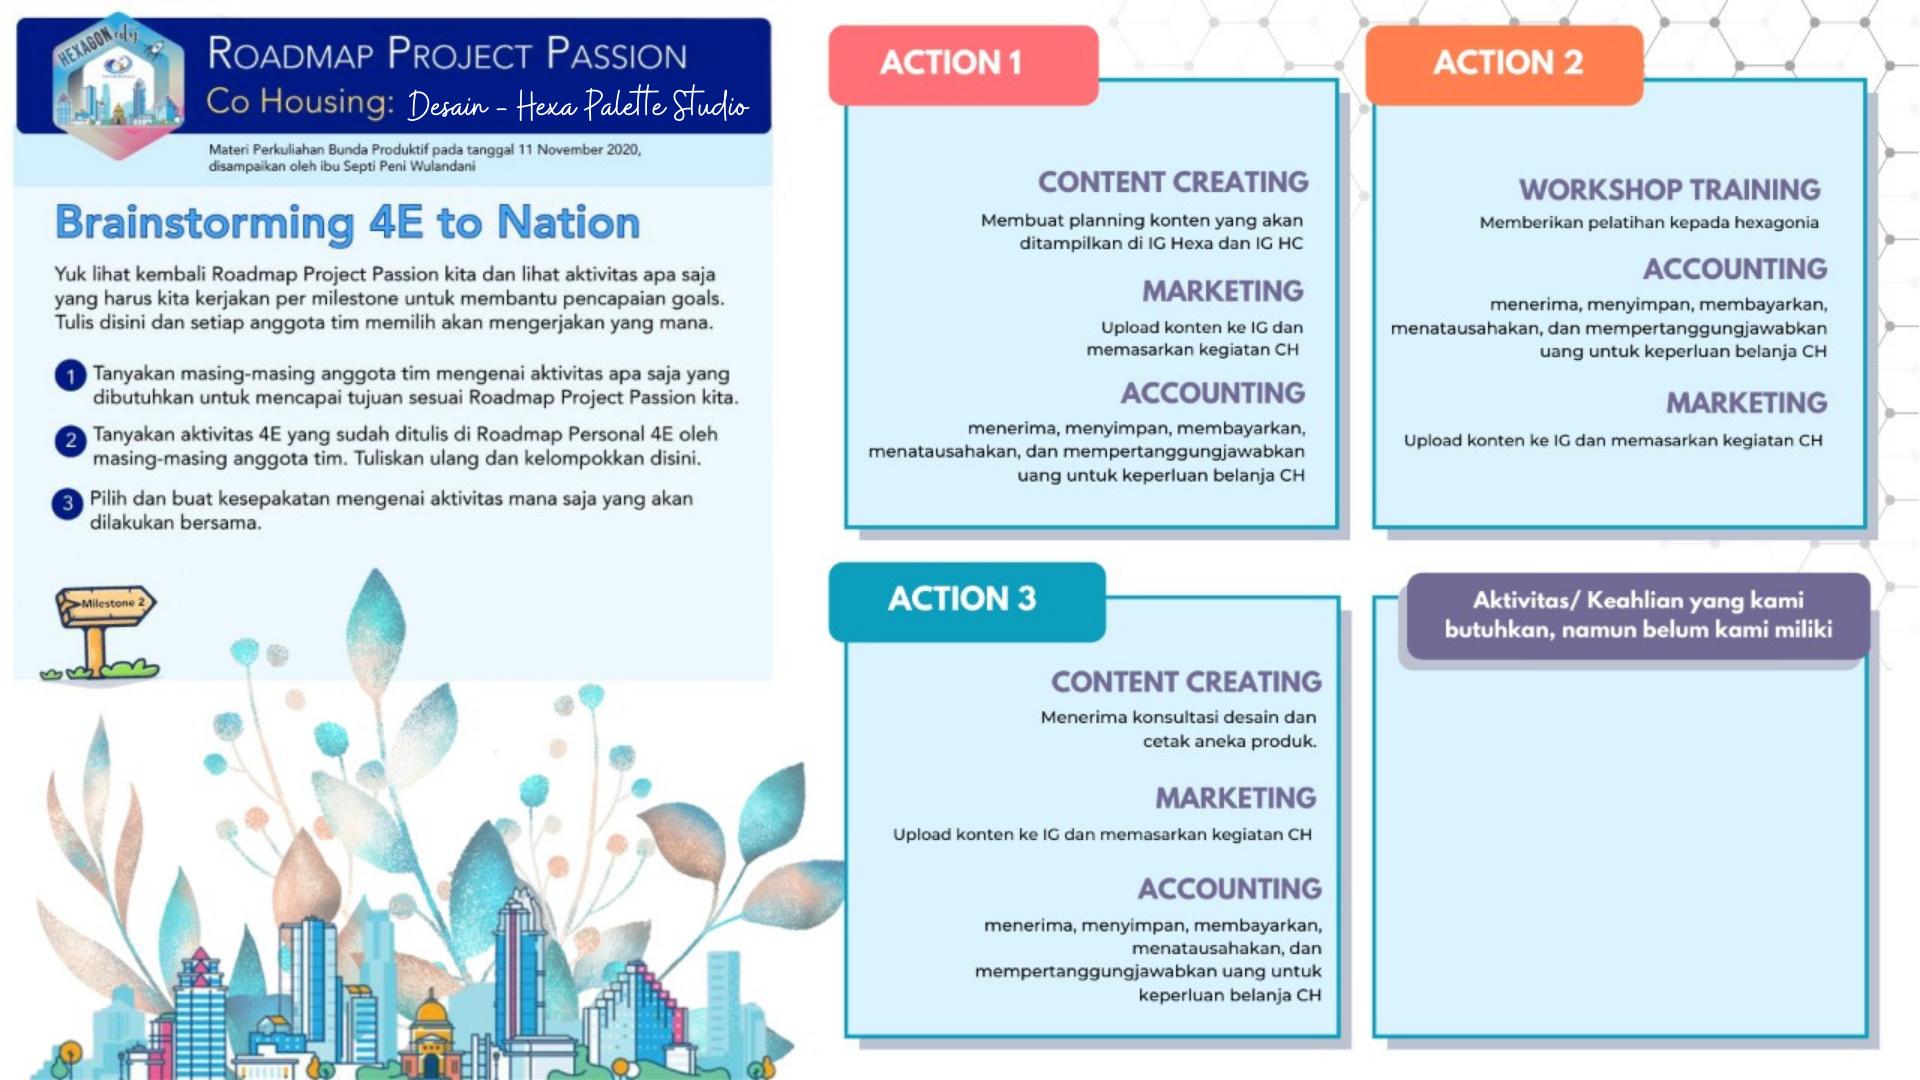 brainstorming 4E to nation